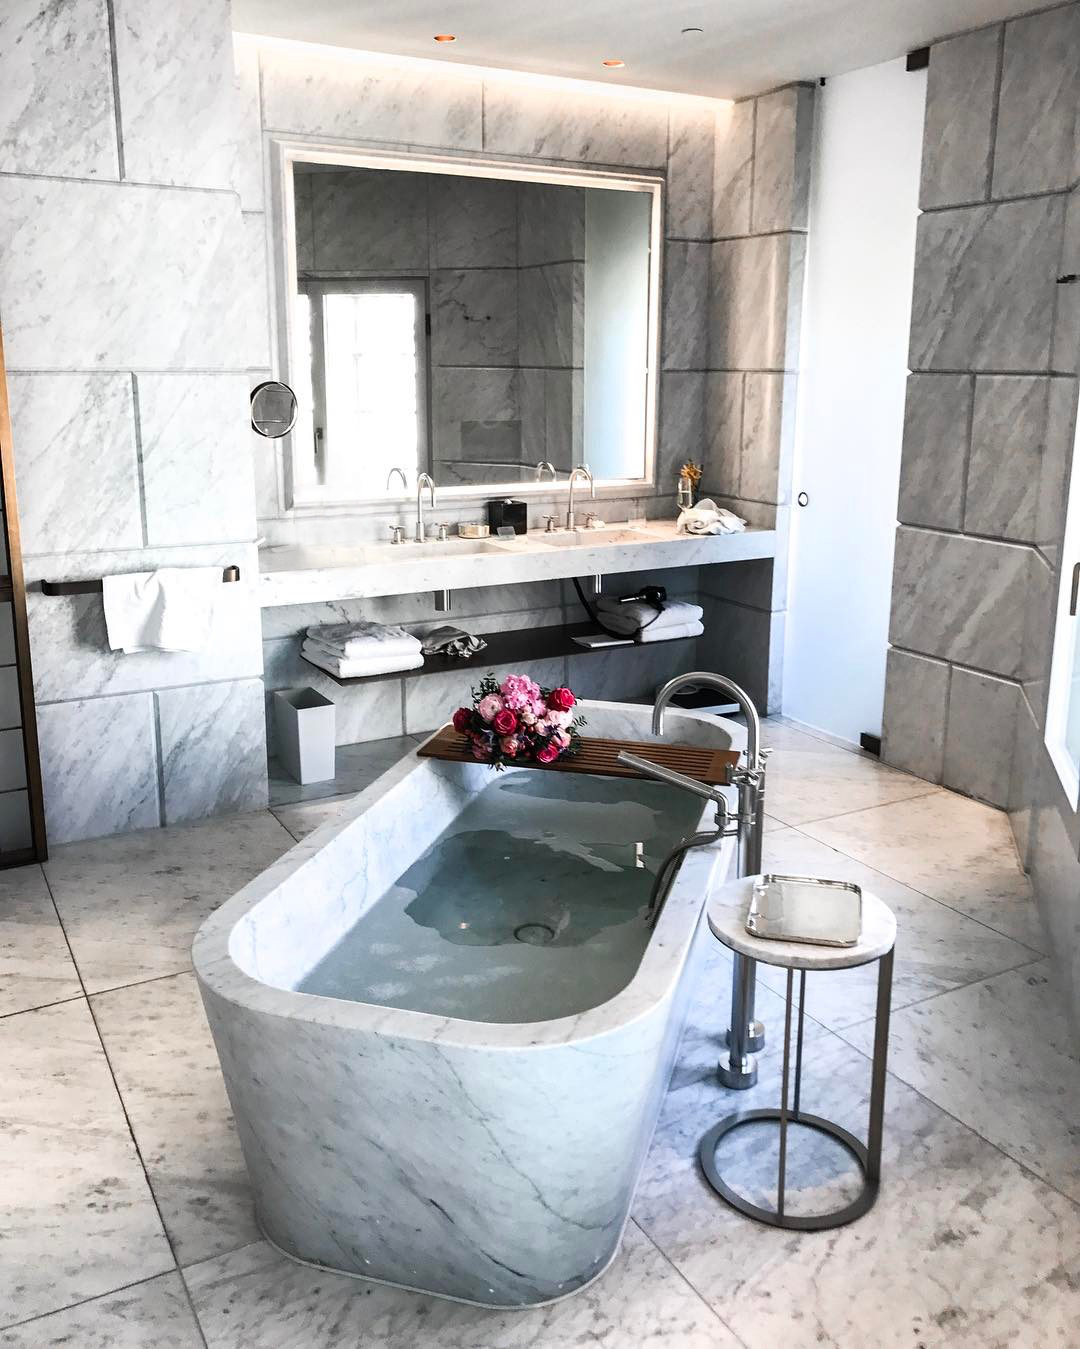 Hotel Café Royal Is Londons Most Instagrammable Hotel Savoir Flair - Royal bath tubs